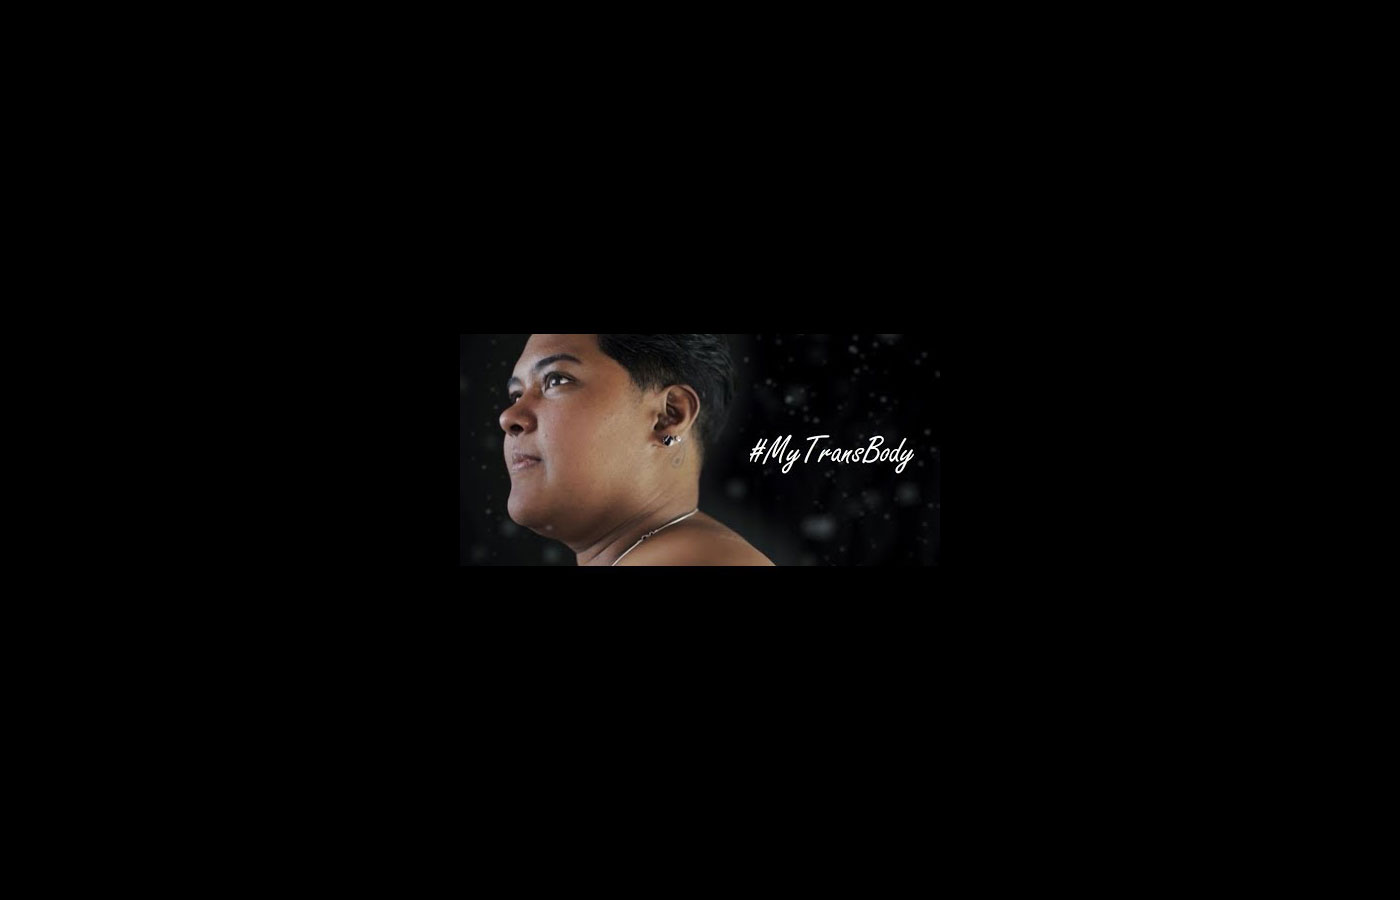 My Trans Body - Transforming Cinema